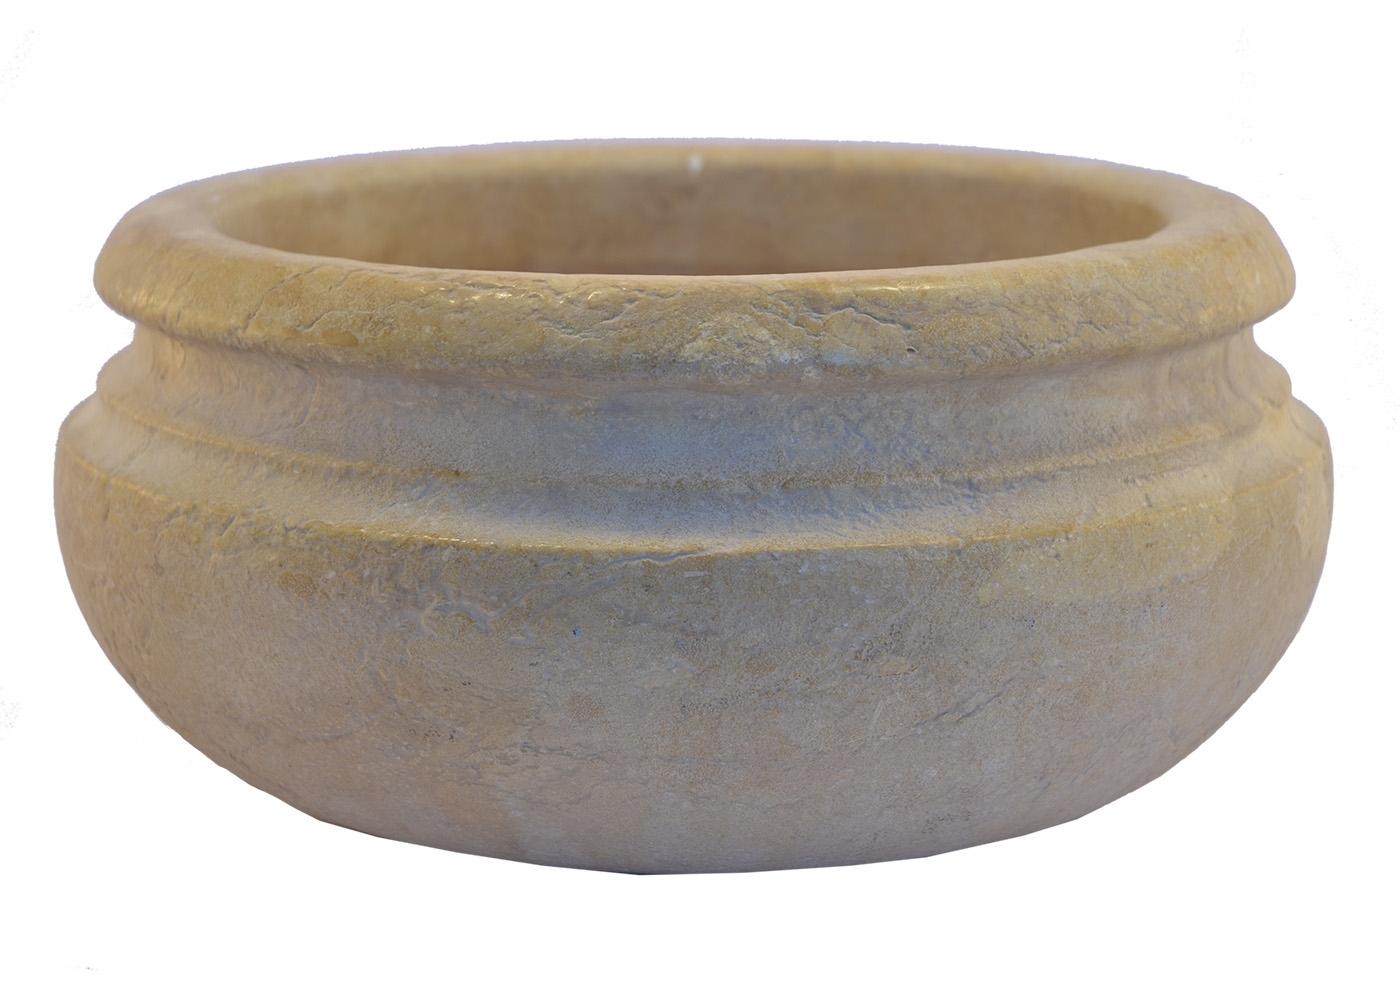 Buy Marble Multipurpose Bowl Planter 17457718 | Italy2Us.com